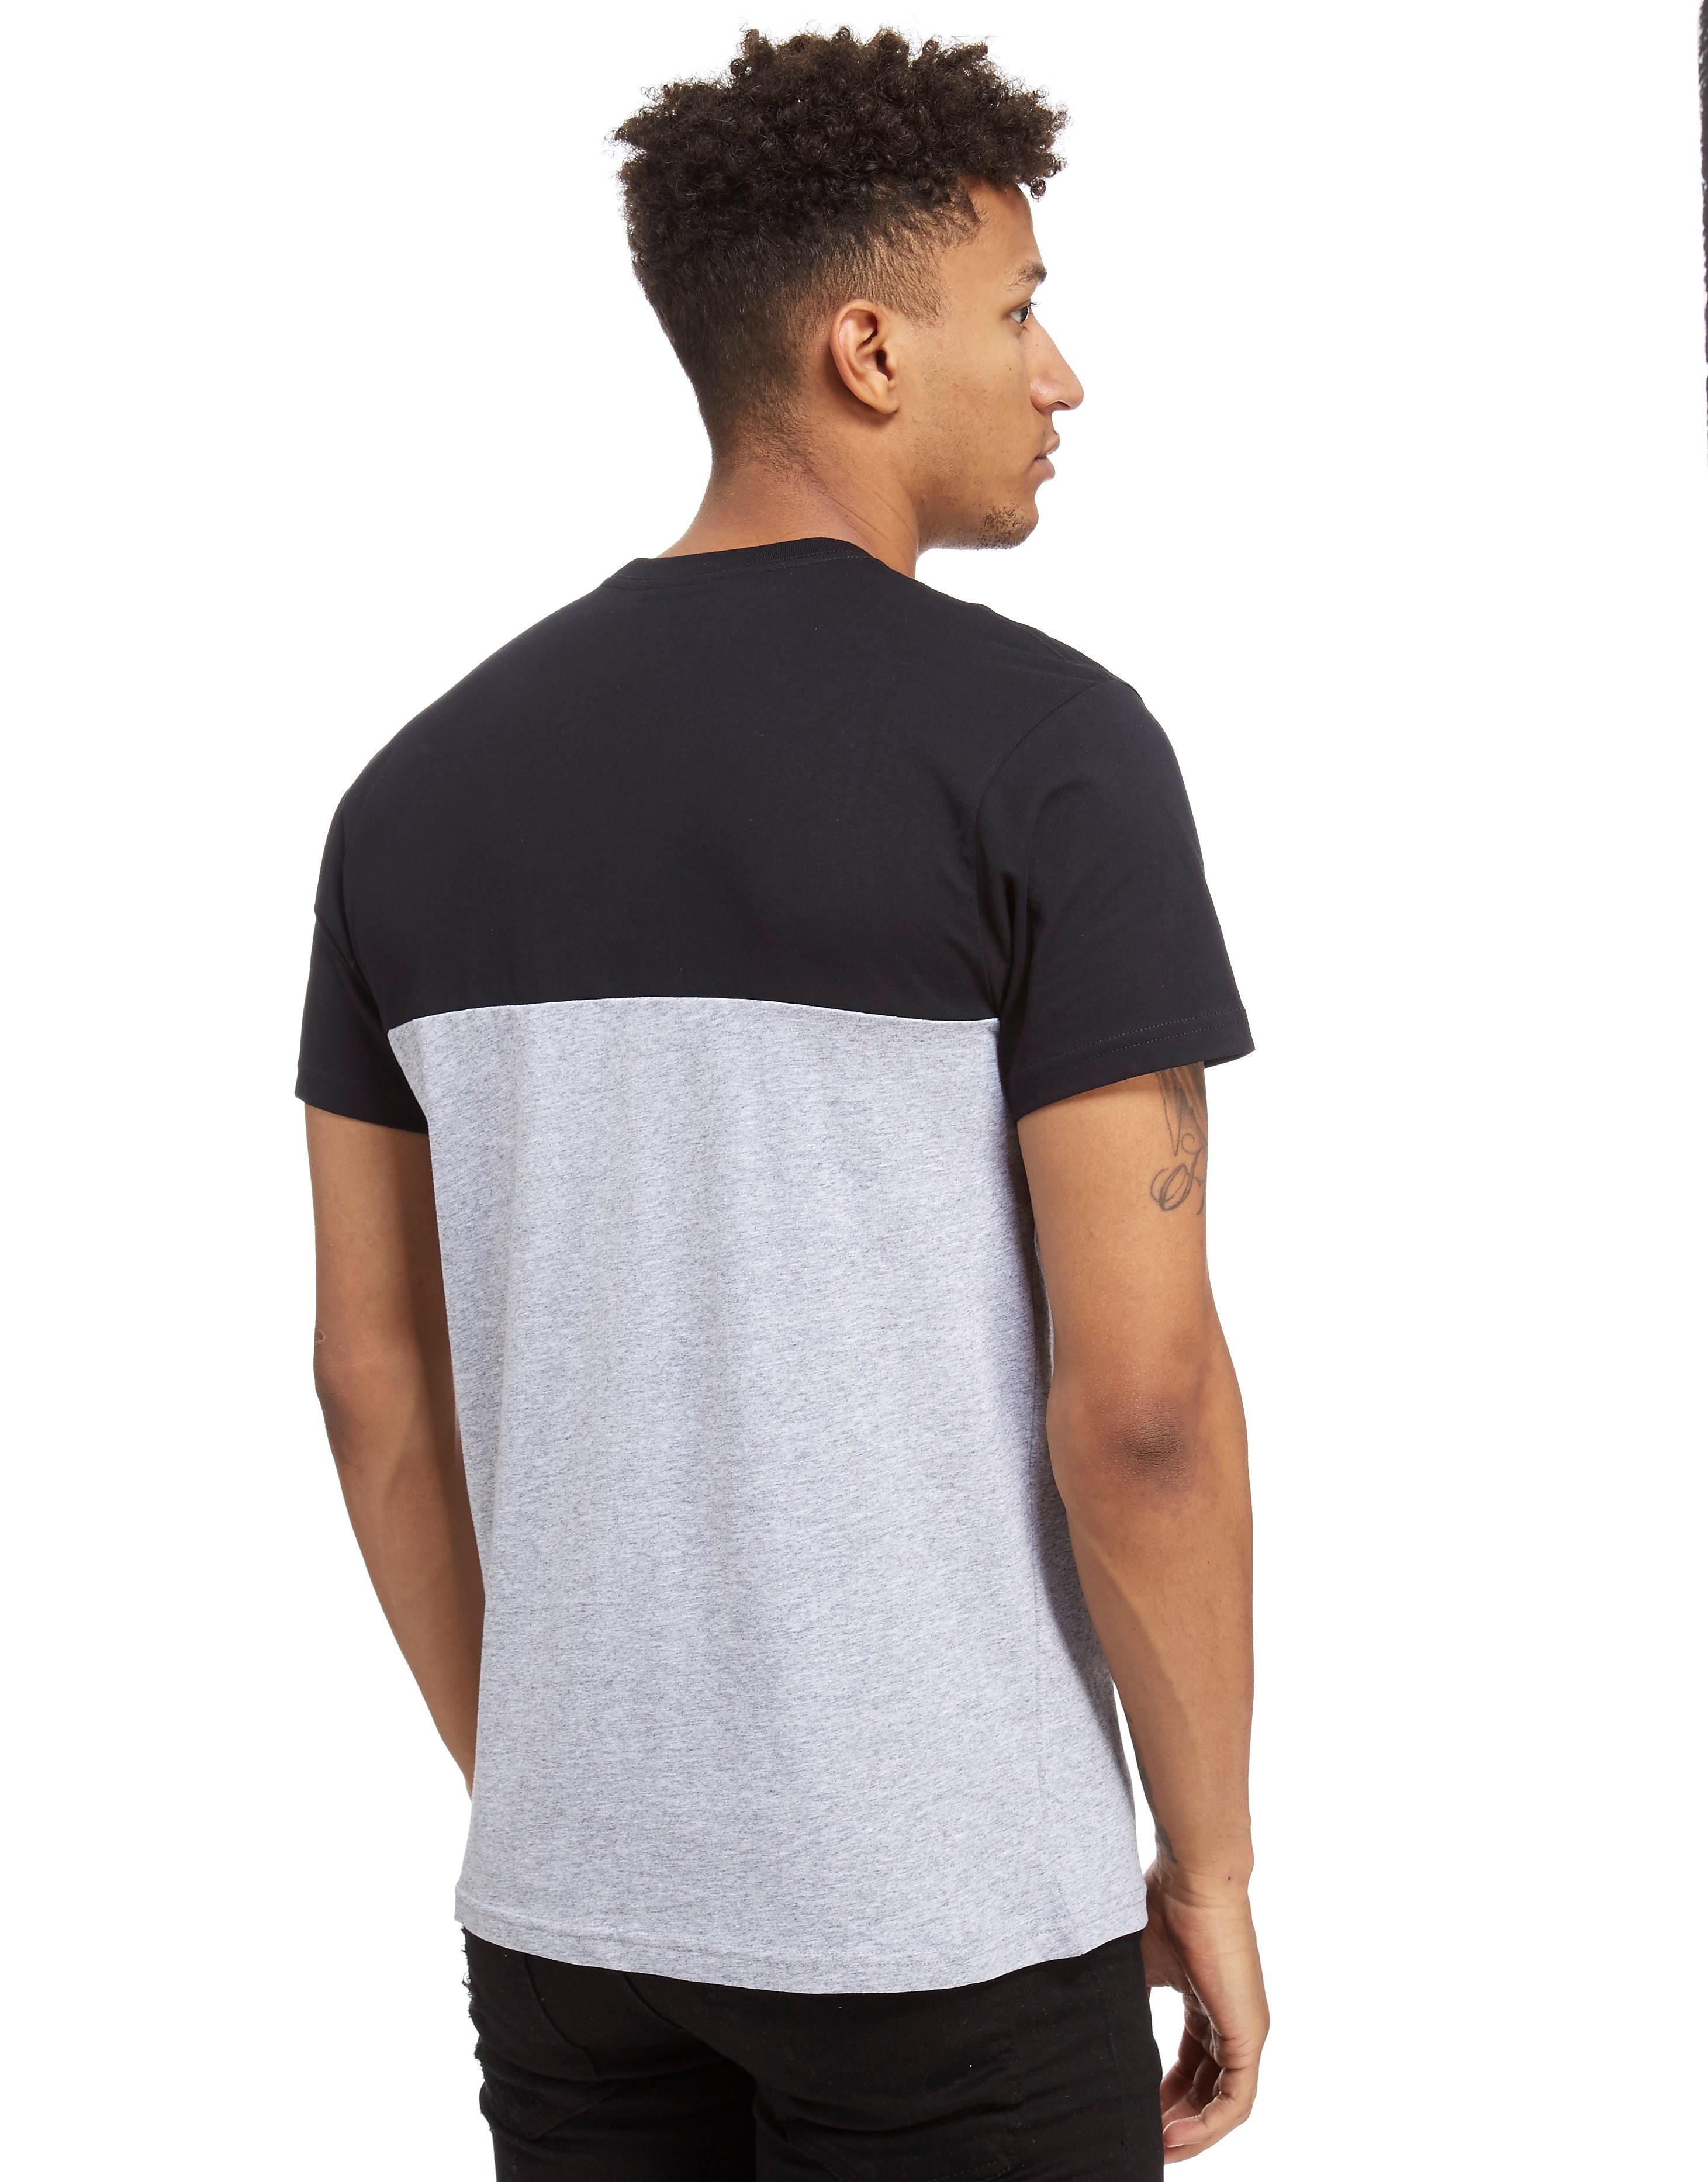 Vans C&S Colourblock T-shirt